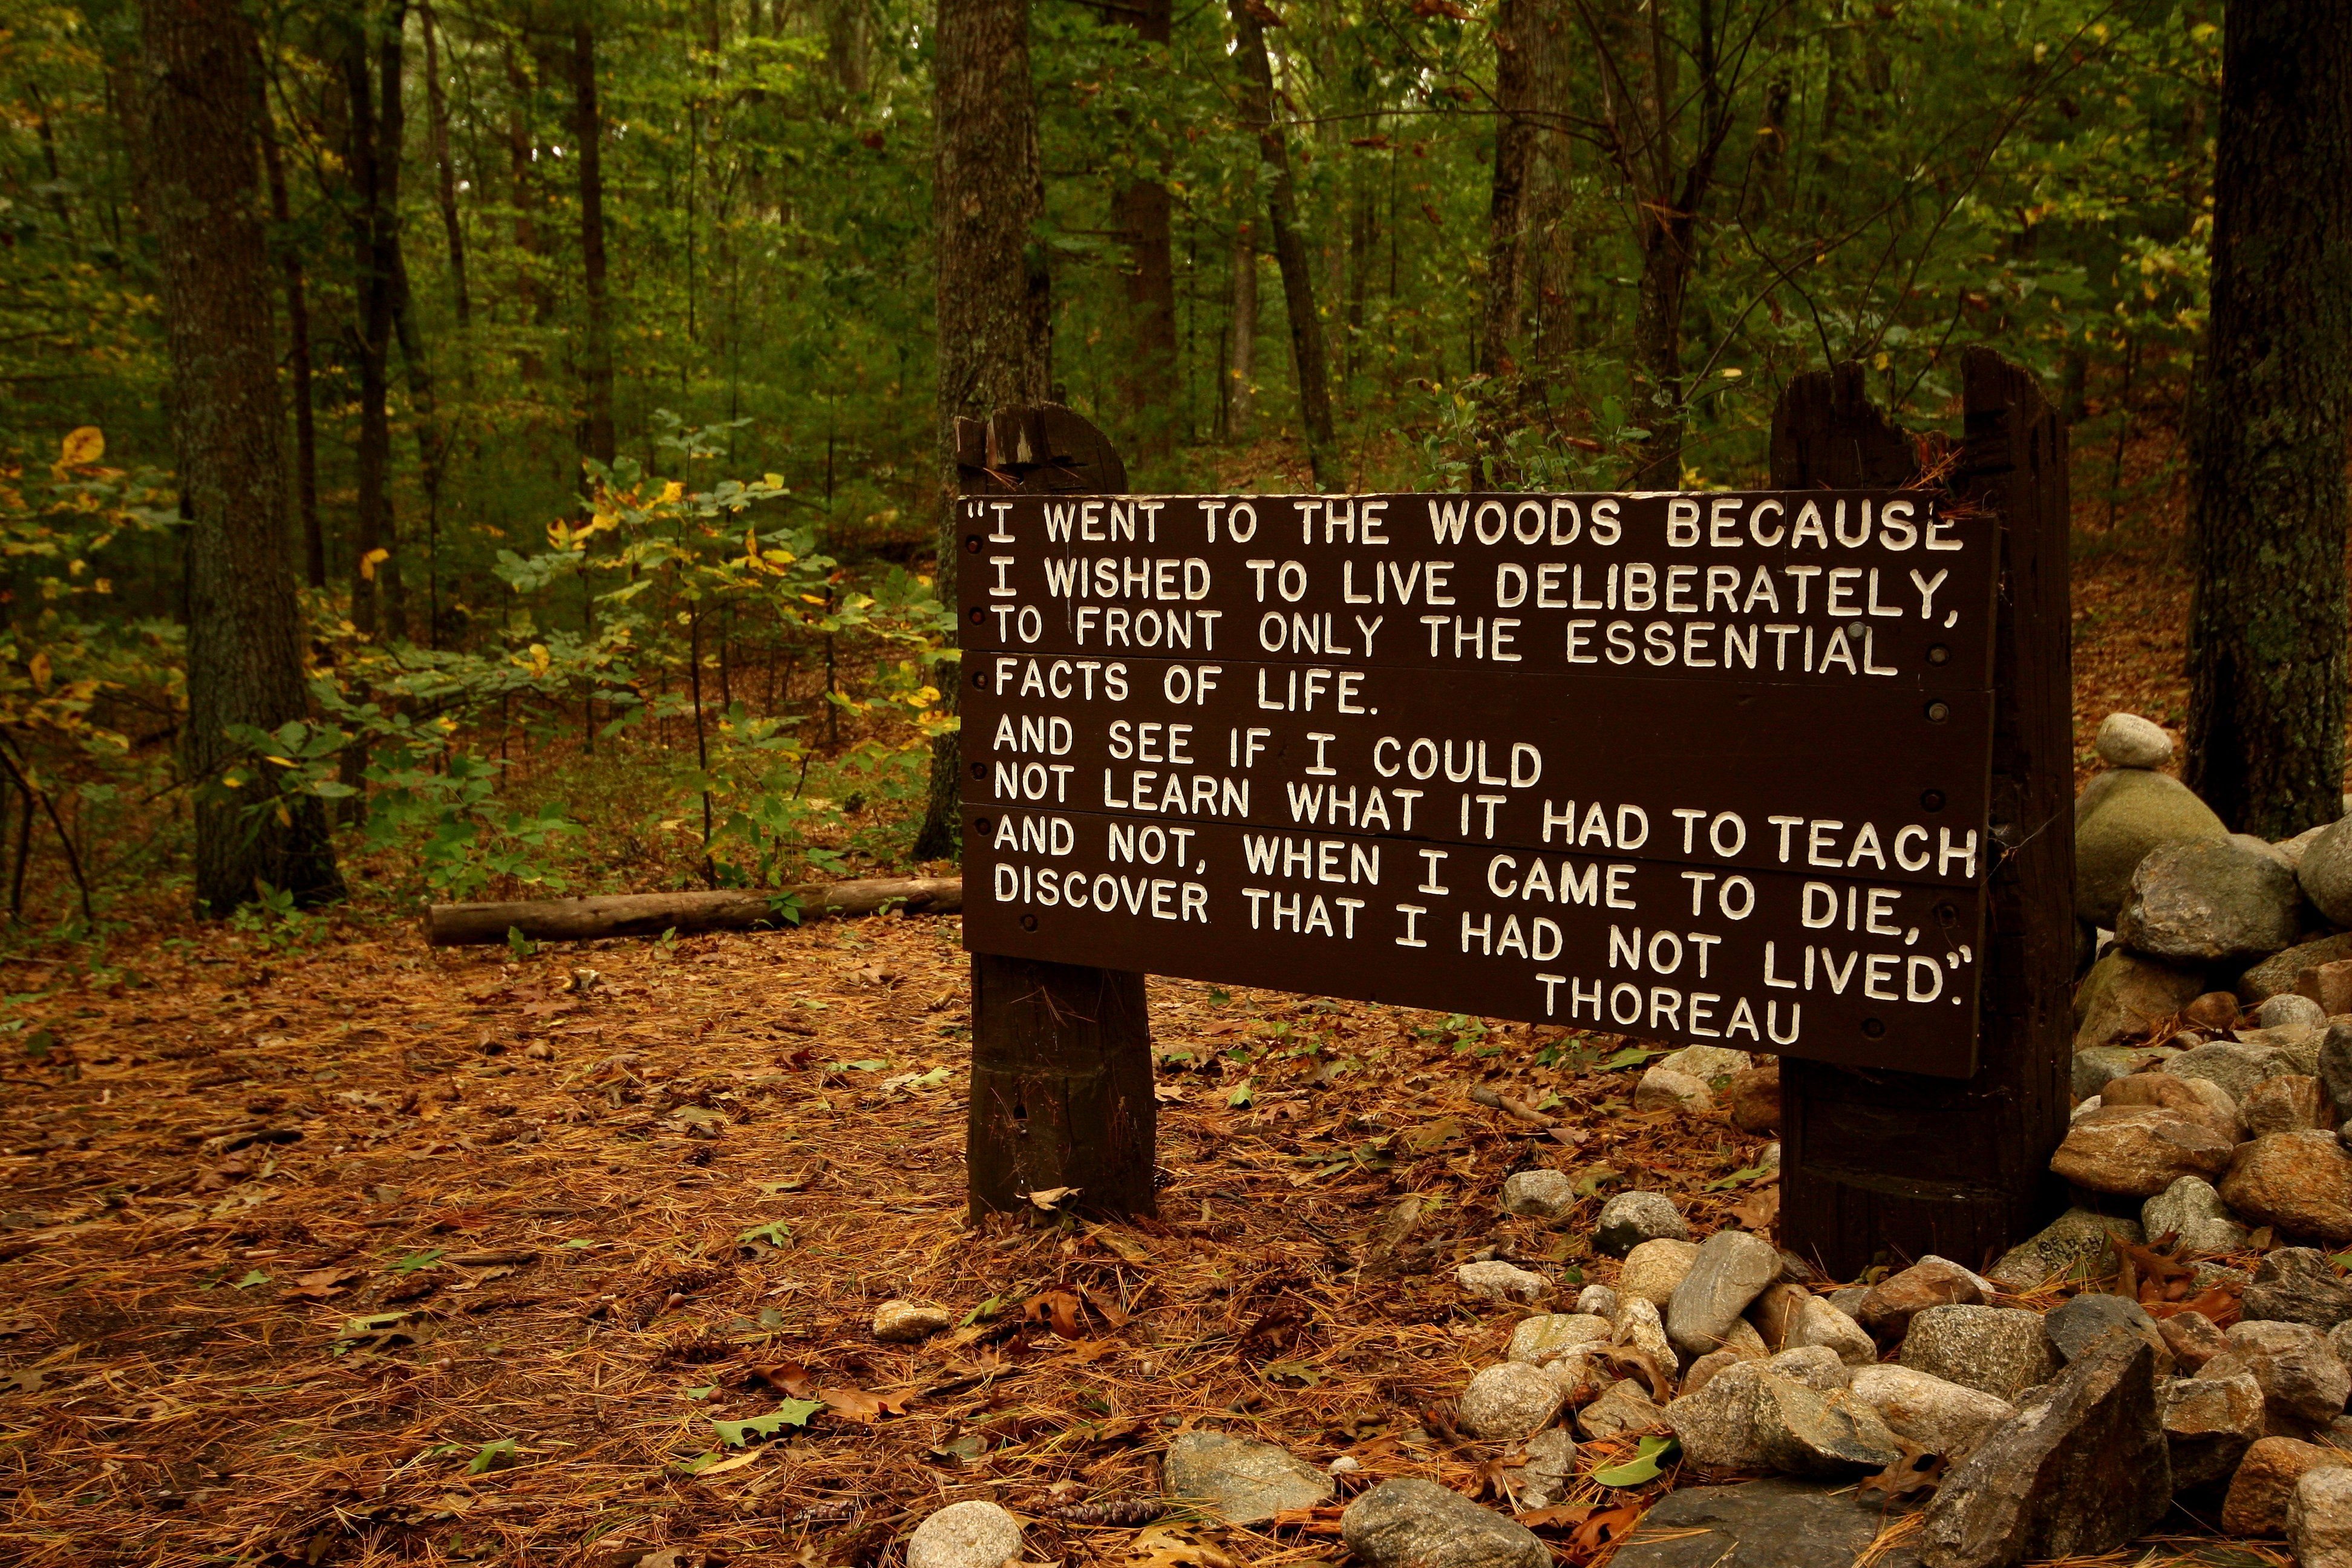 A Suburban Thoreau - Bringing the Spirit of Walden Home